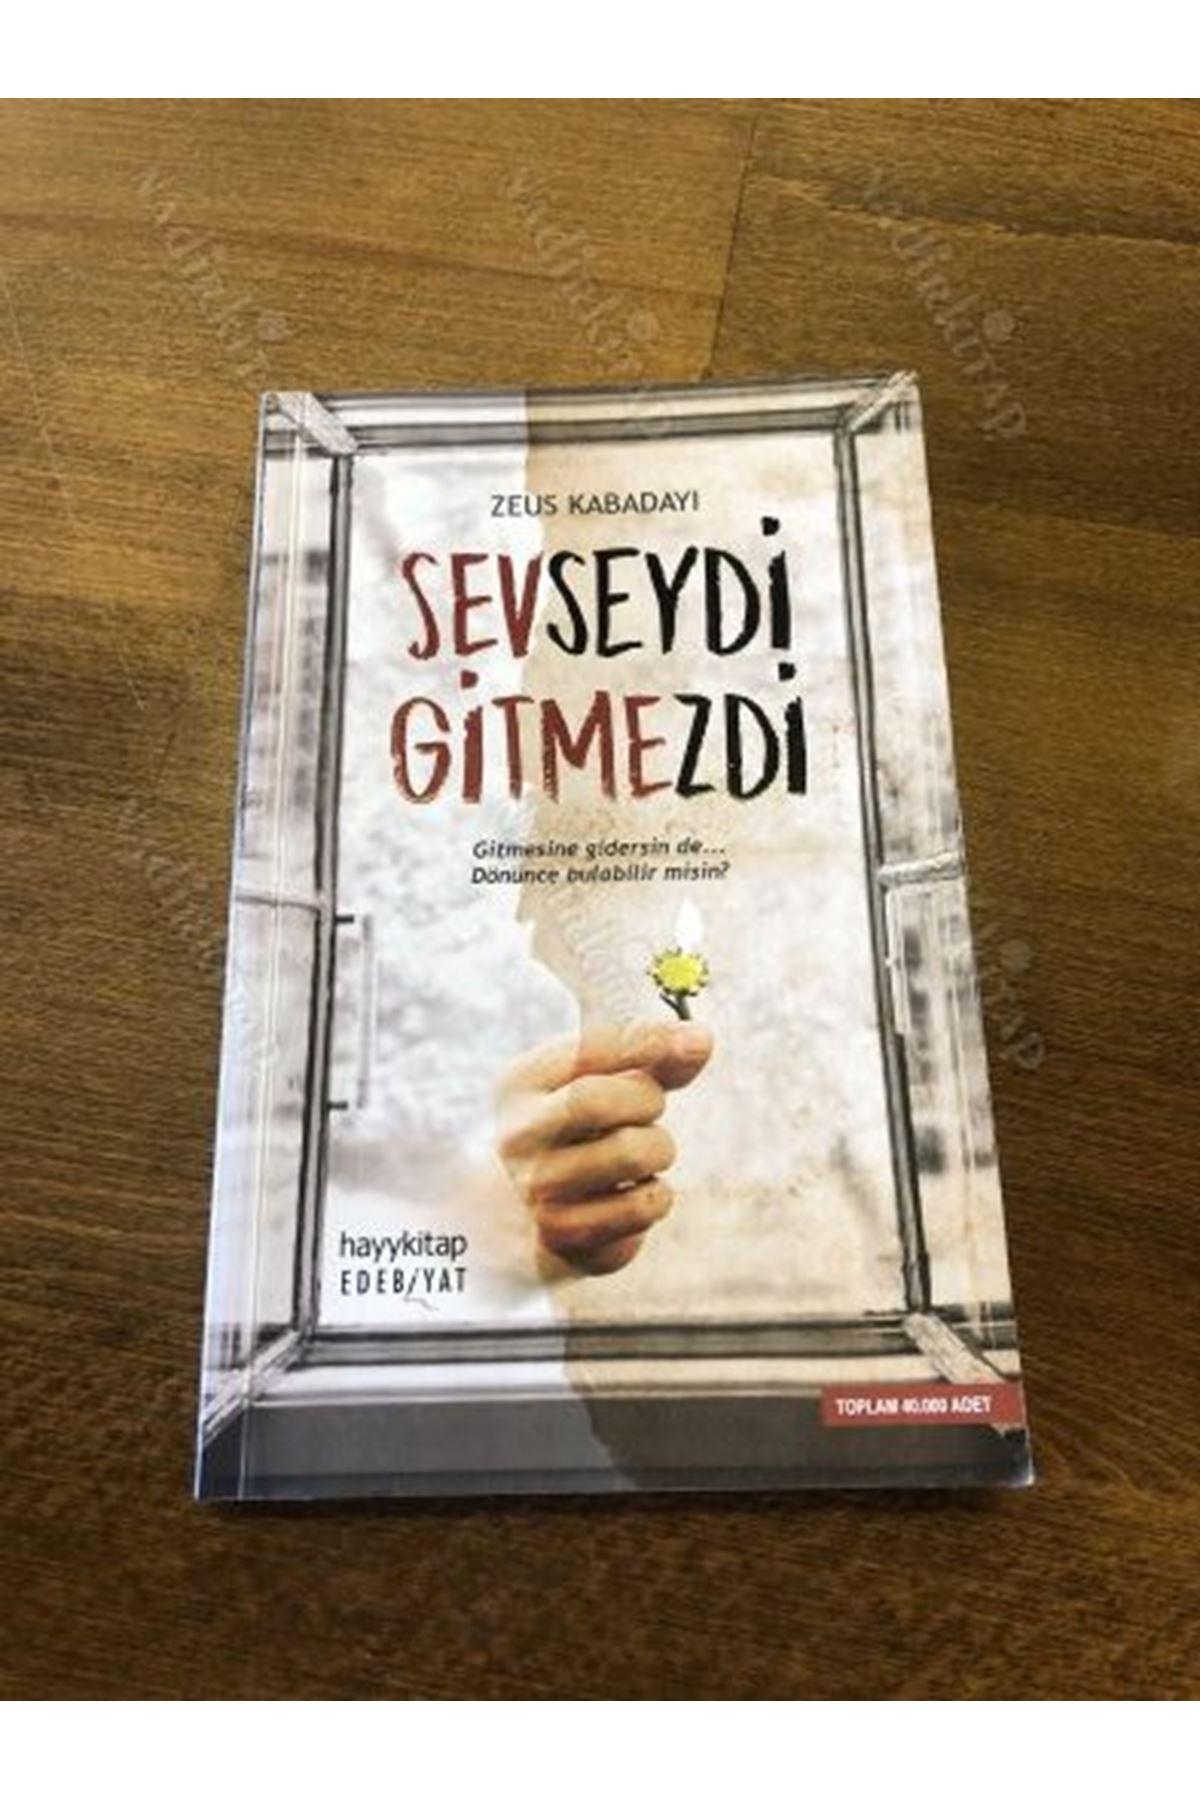 ZEUS KABADAYI - SEVSEYDİ GİTMEZDİ